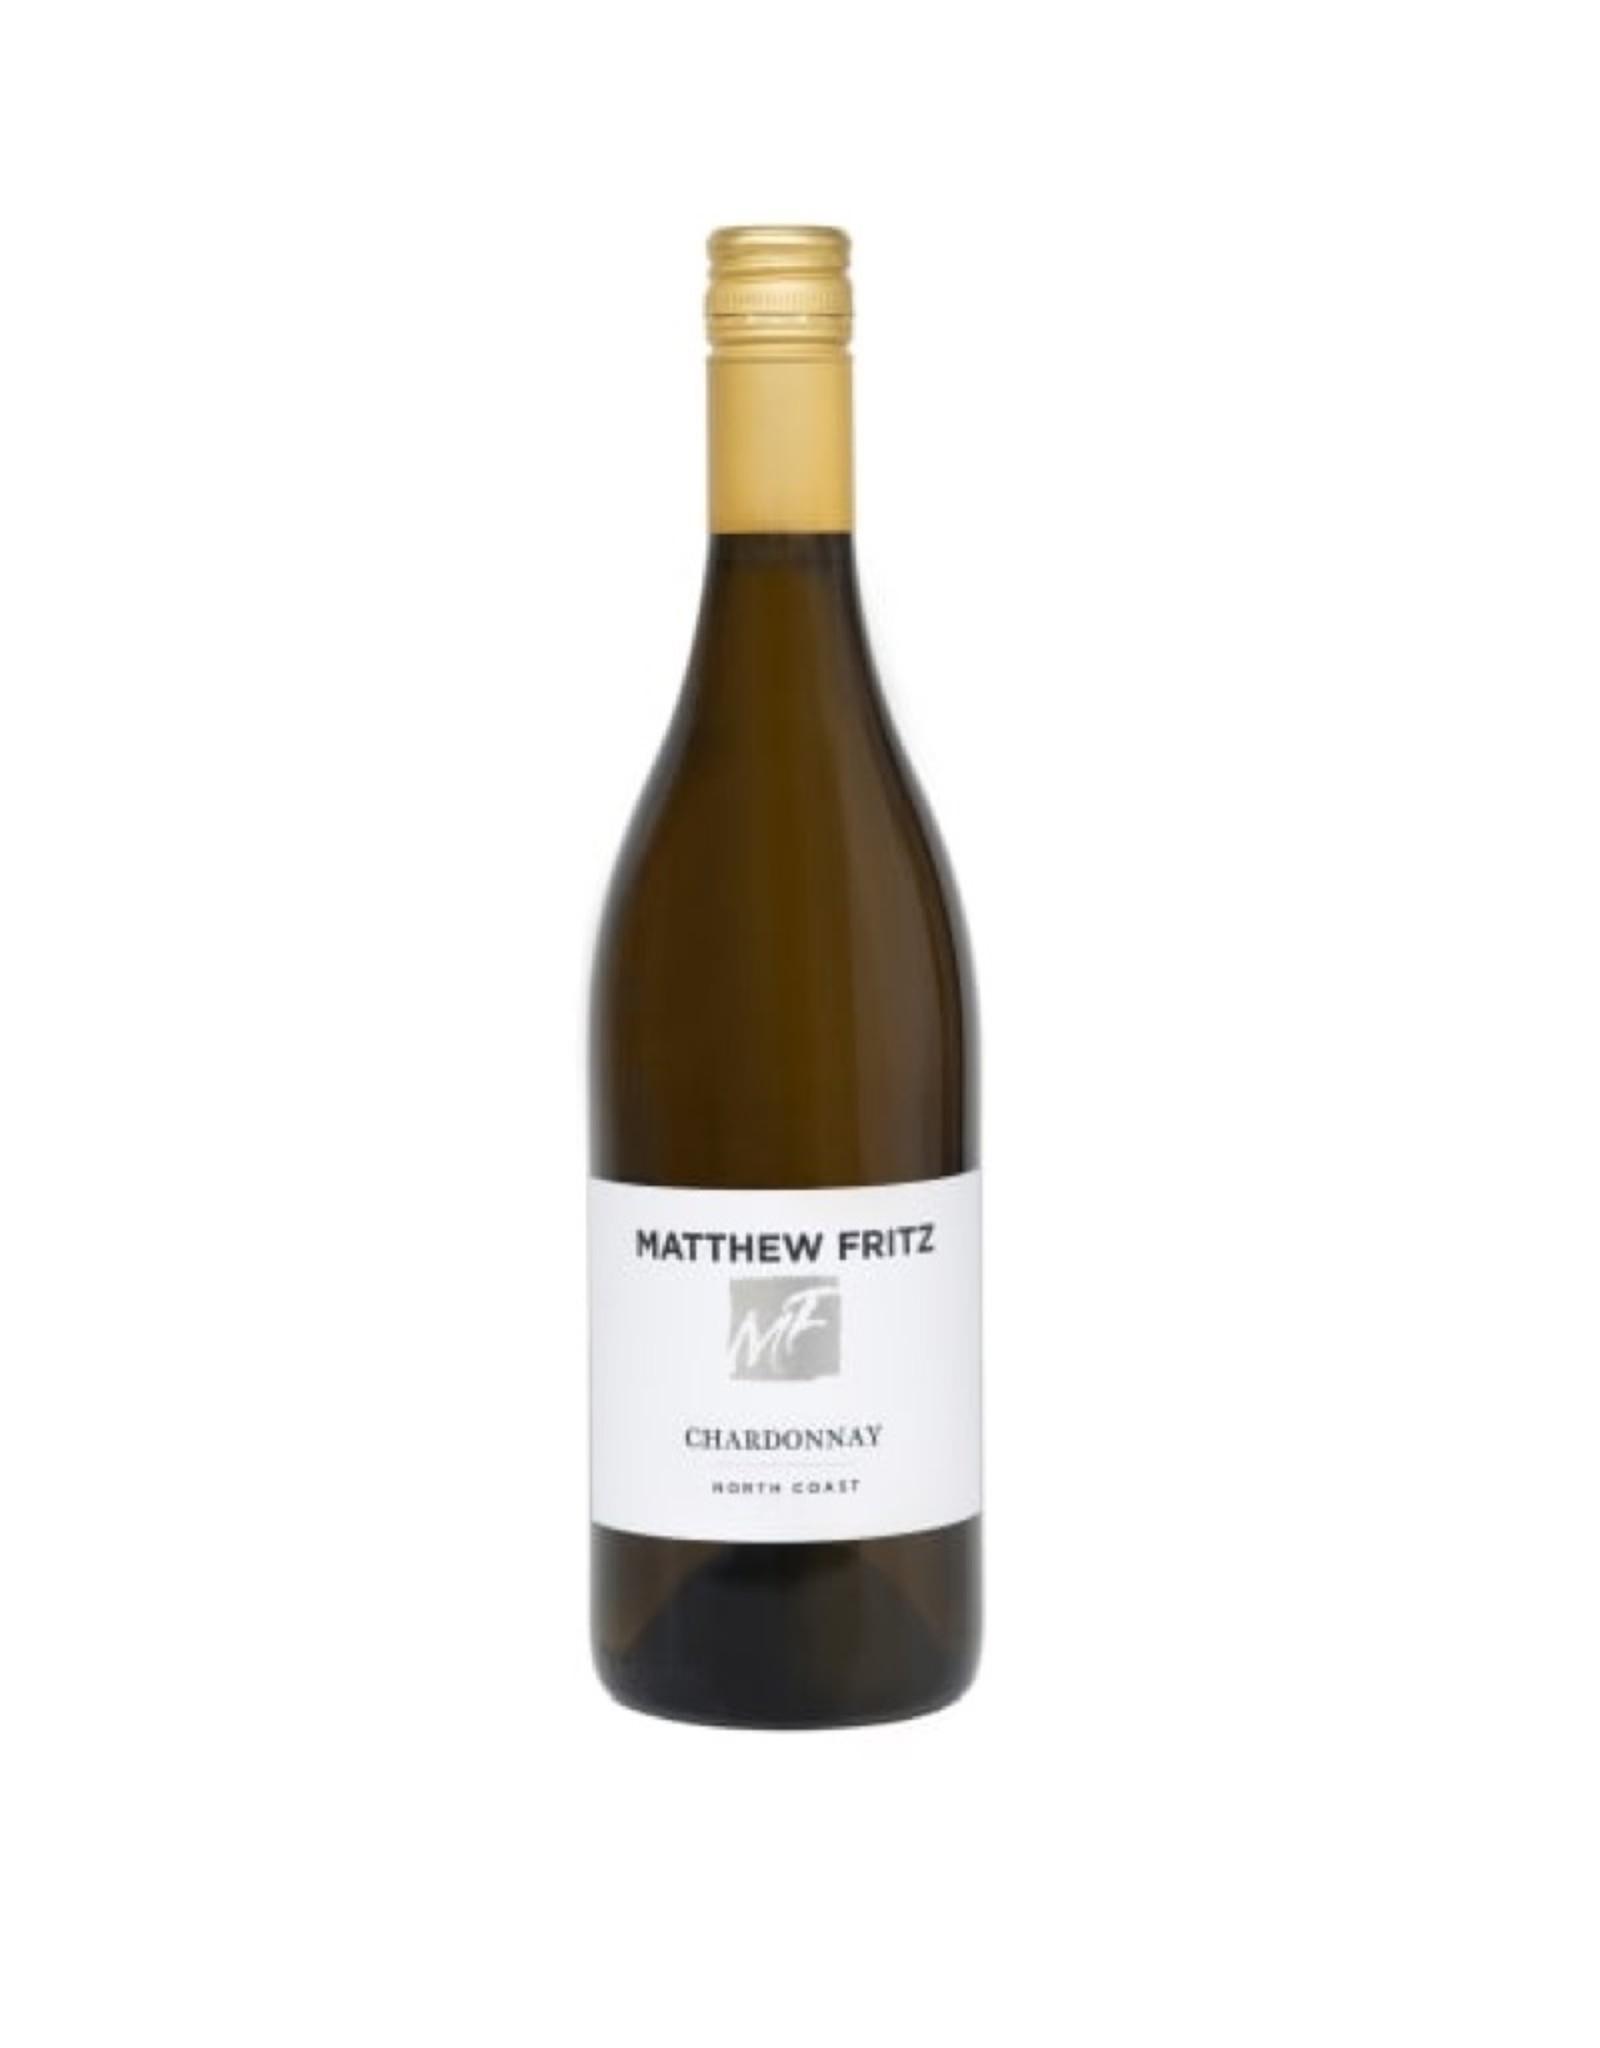 Matthew Fritz Chardonnay North Coast 2018